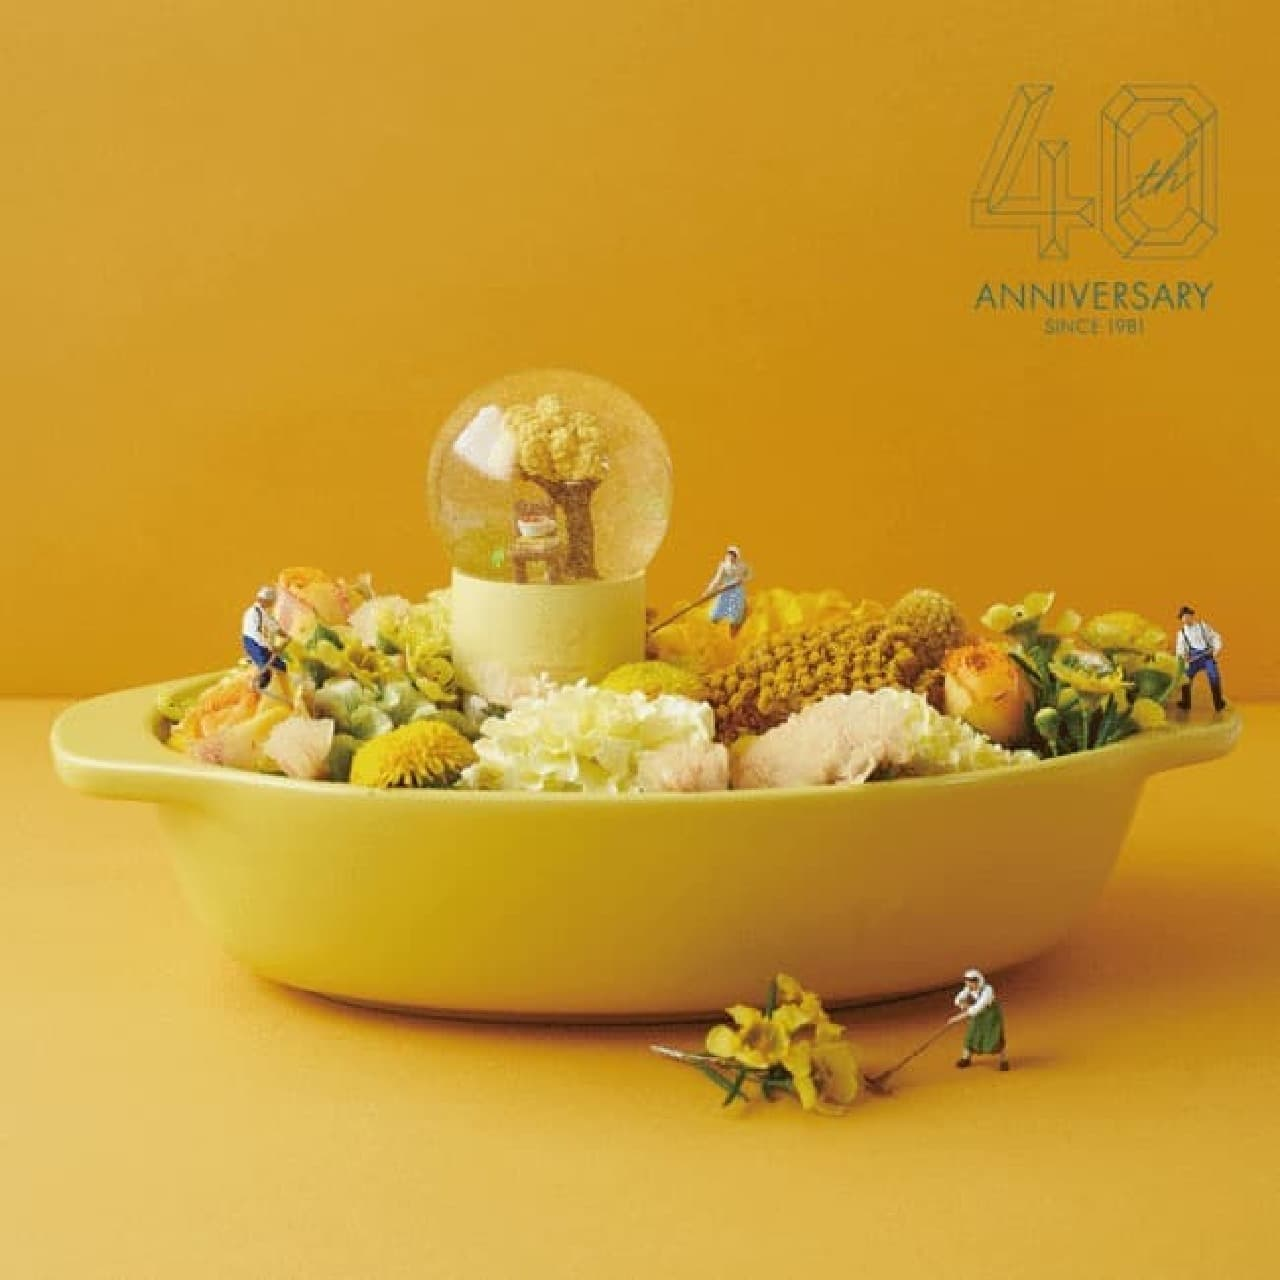 Afternoon Tea LIVING「四季のティータイムスノードーム」プレゼント企画 -- 設立40周年記念